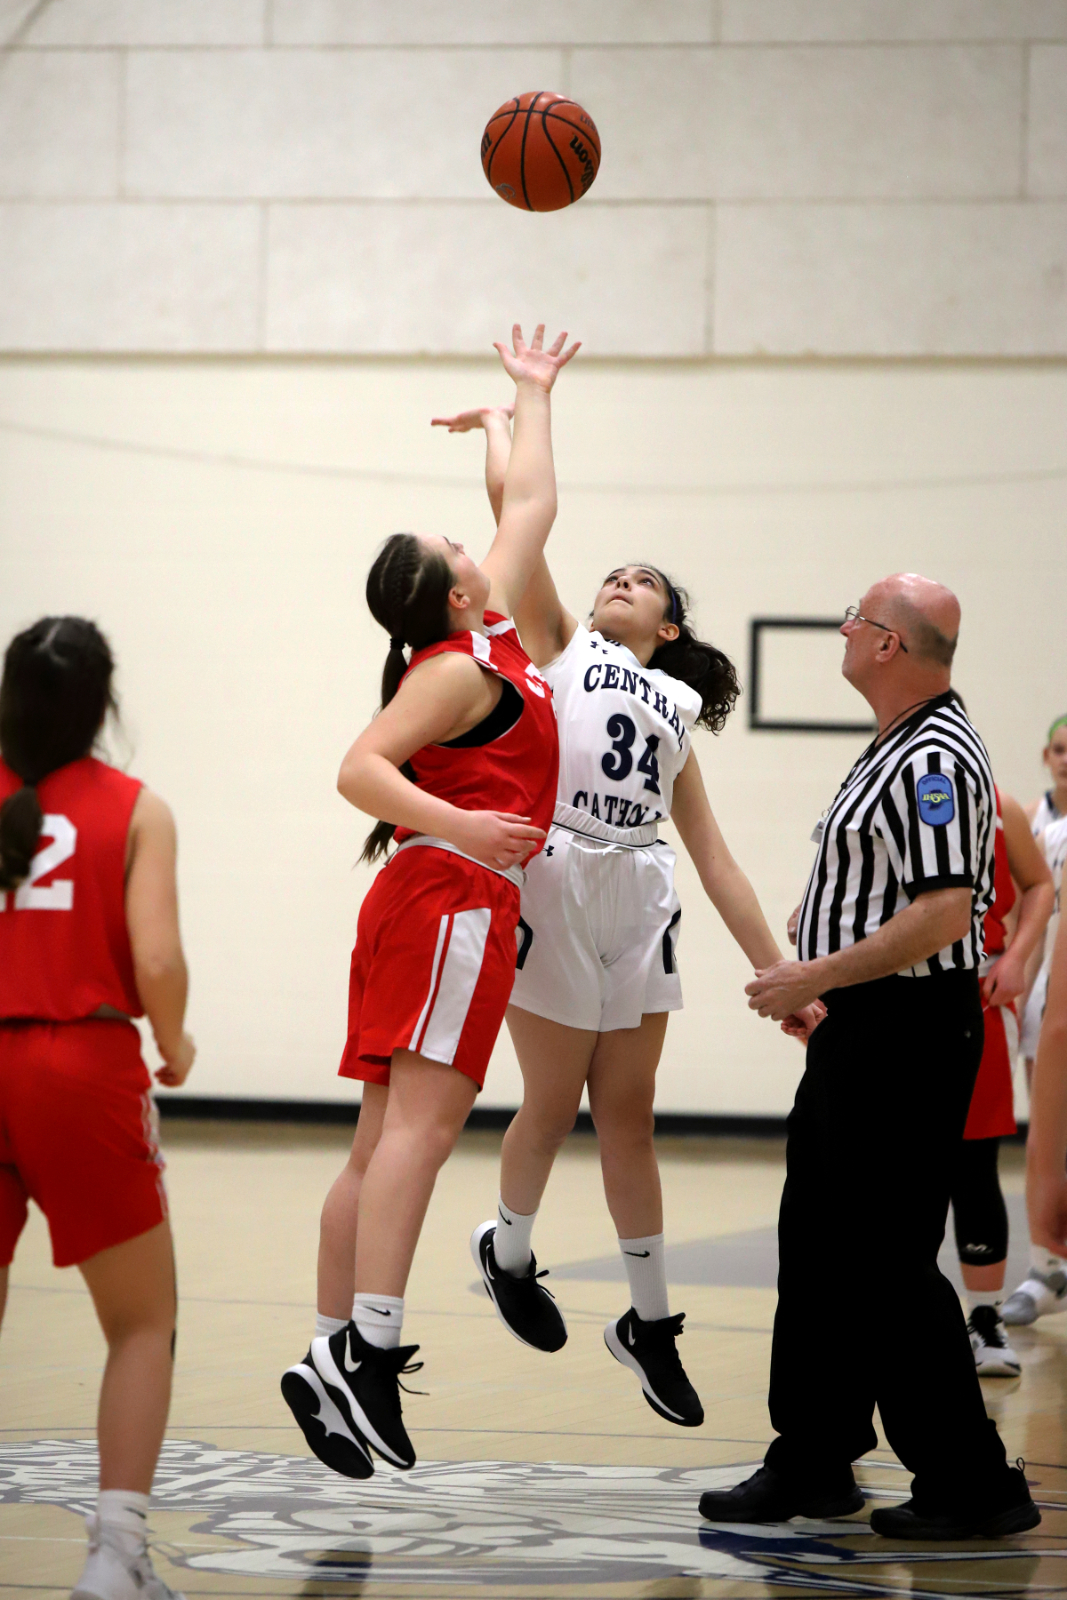 CC 7th Grade Girls Basketball vs Southwestern 2-25-21